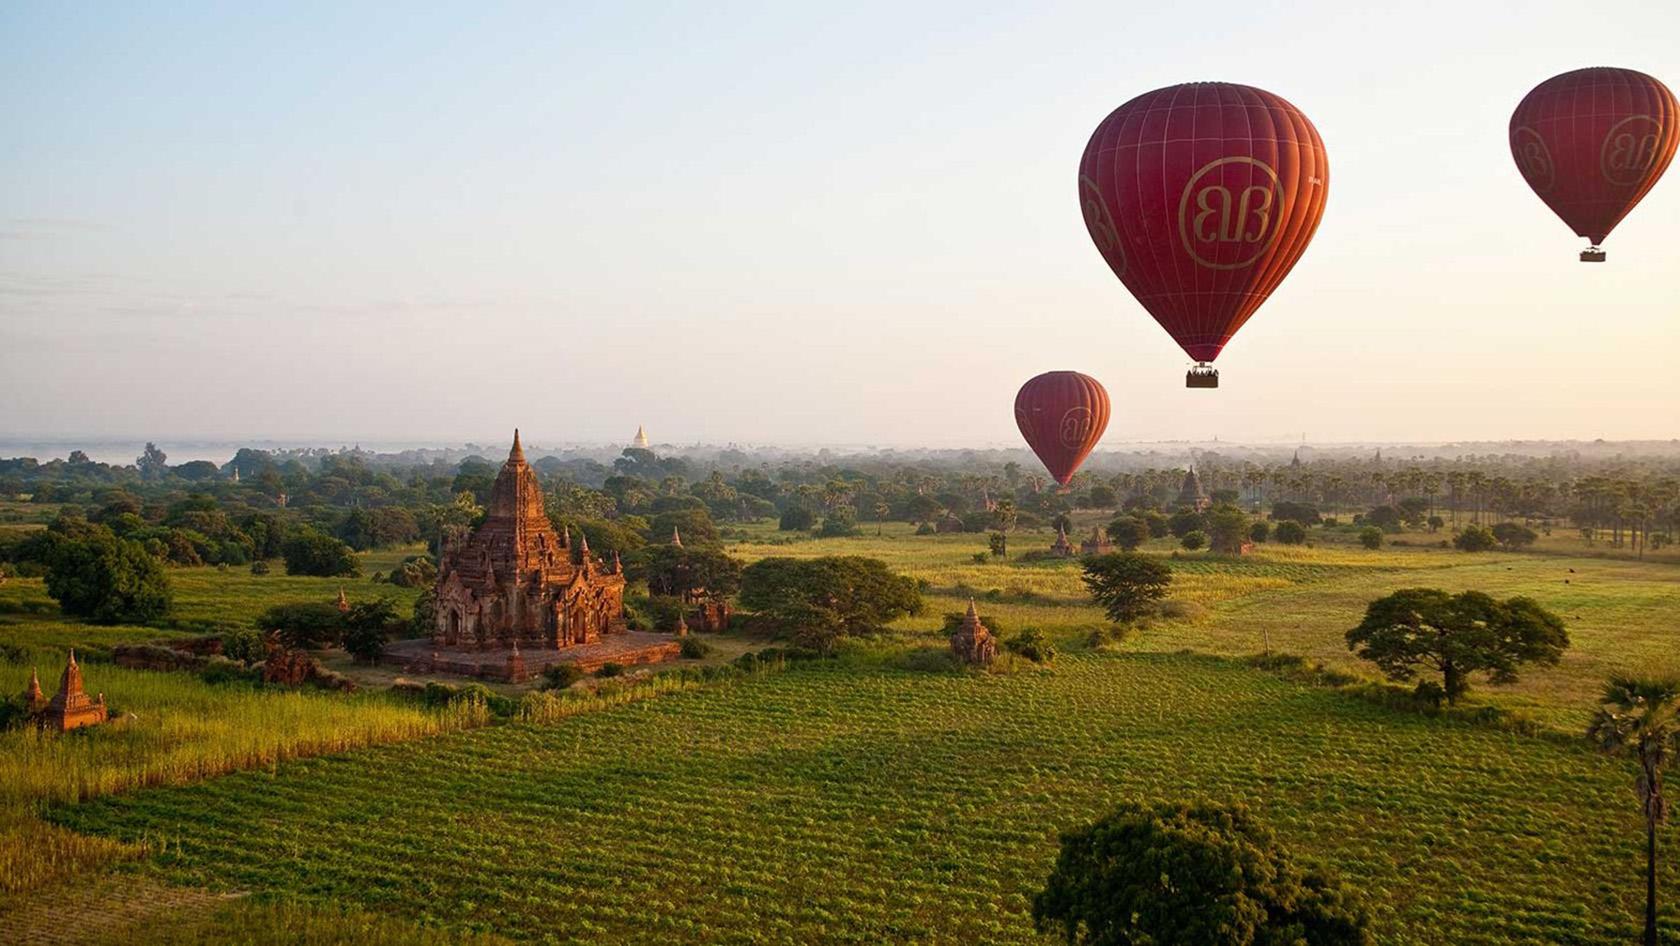 PRIVATE BALLOON FLIGHT, BAGAN, MYANMAR